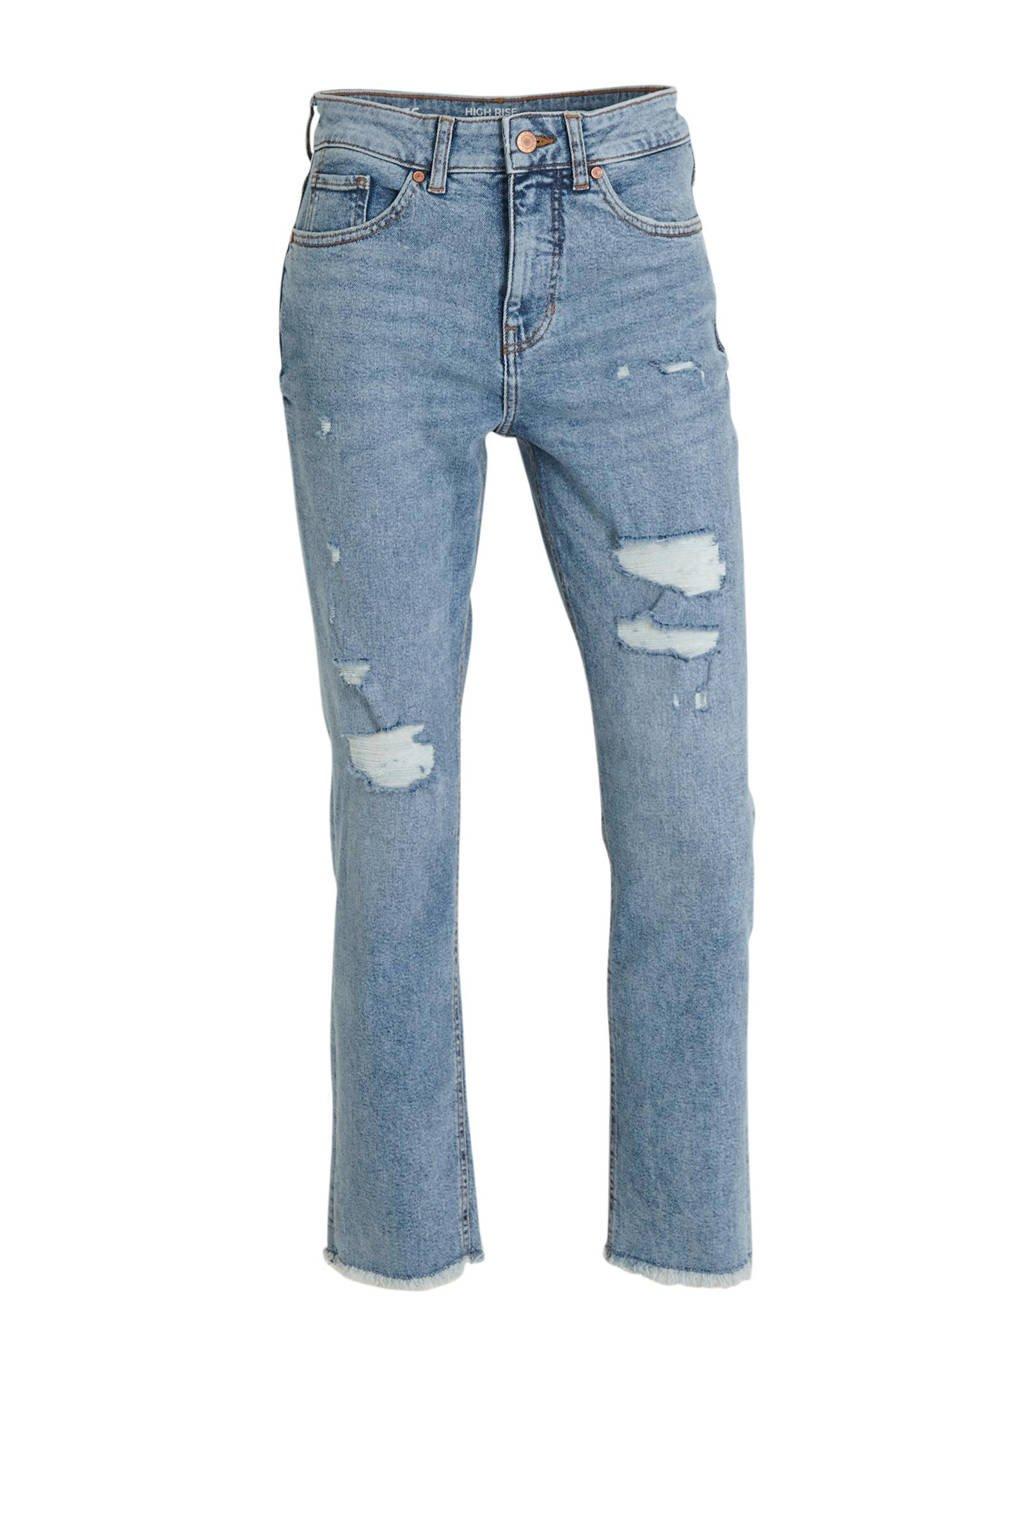 C&A Clockhouse high waist straight fit jeans blauw, Blauw